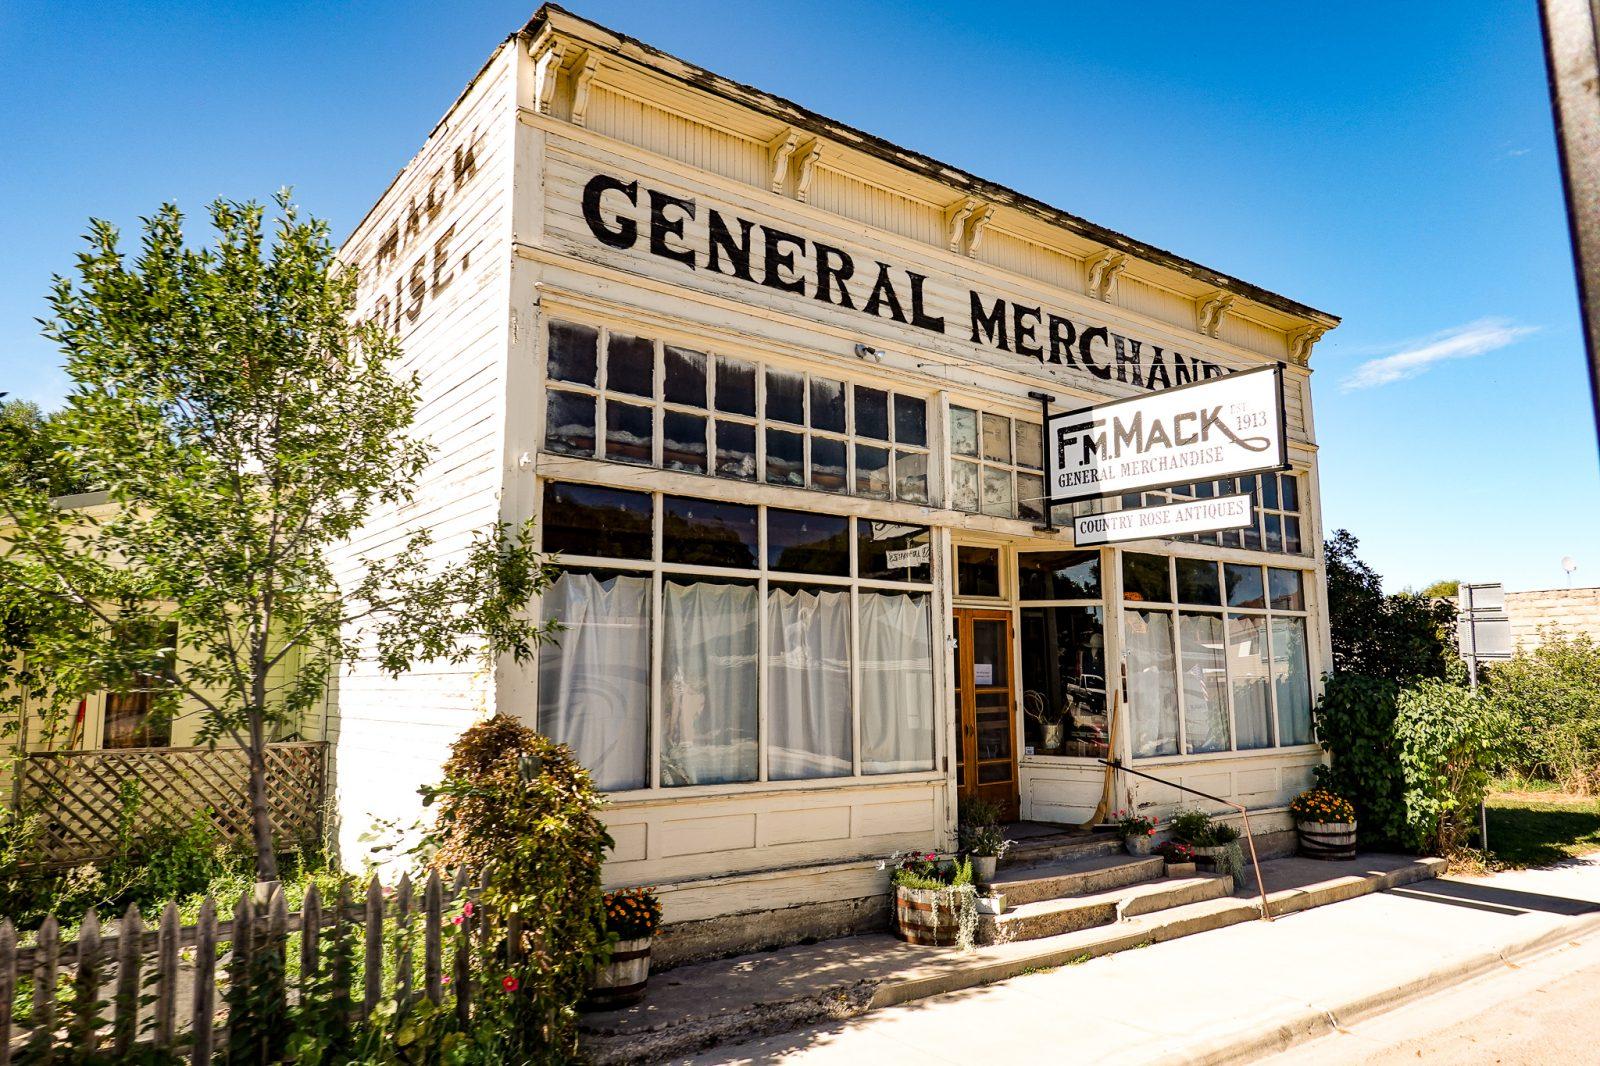 gammel butikk i usa